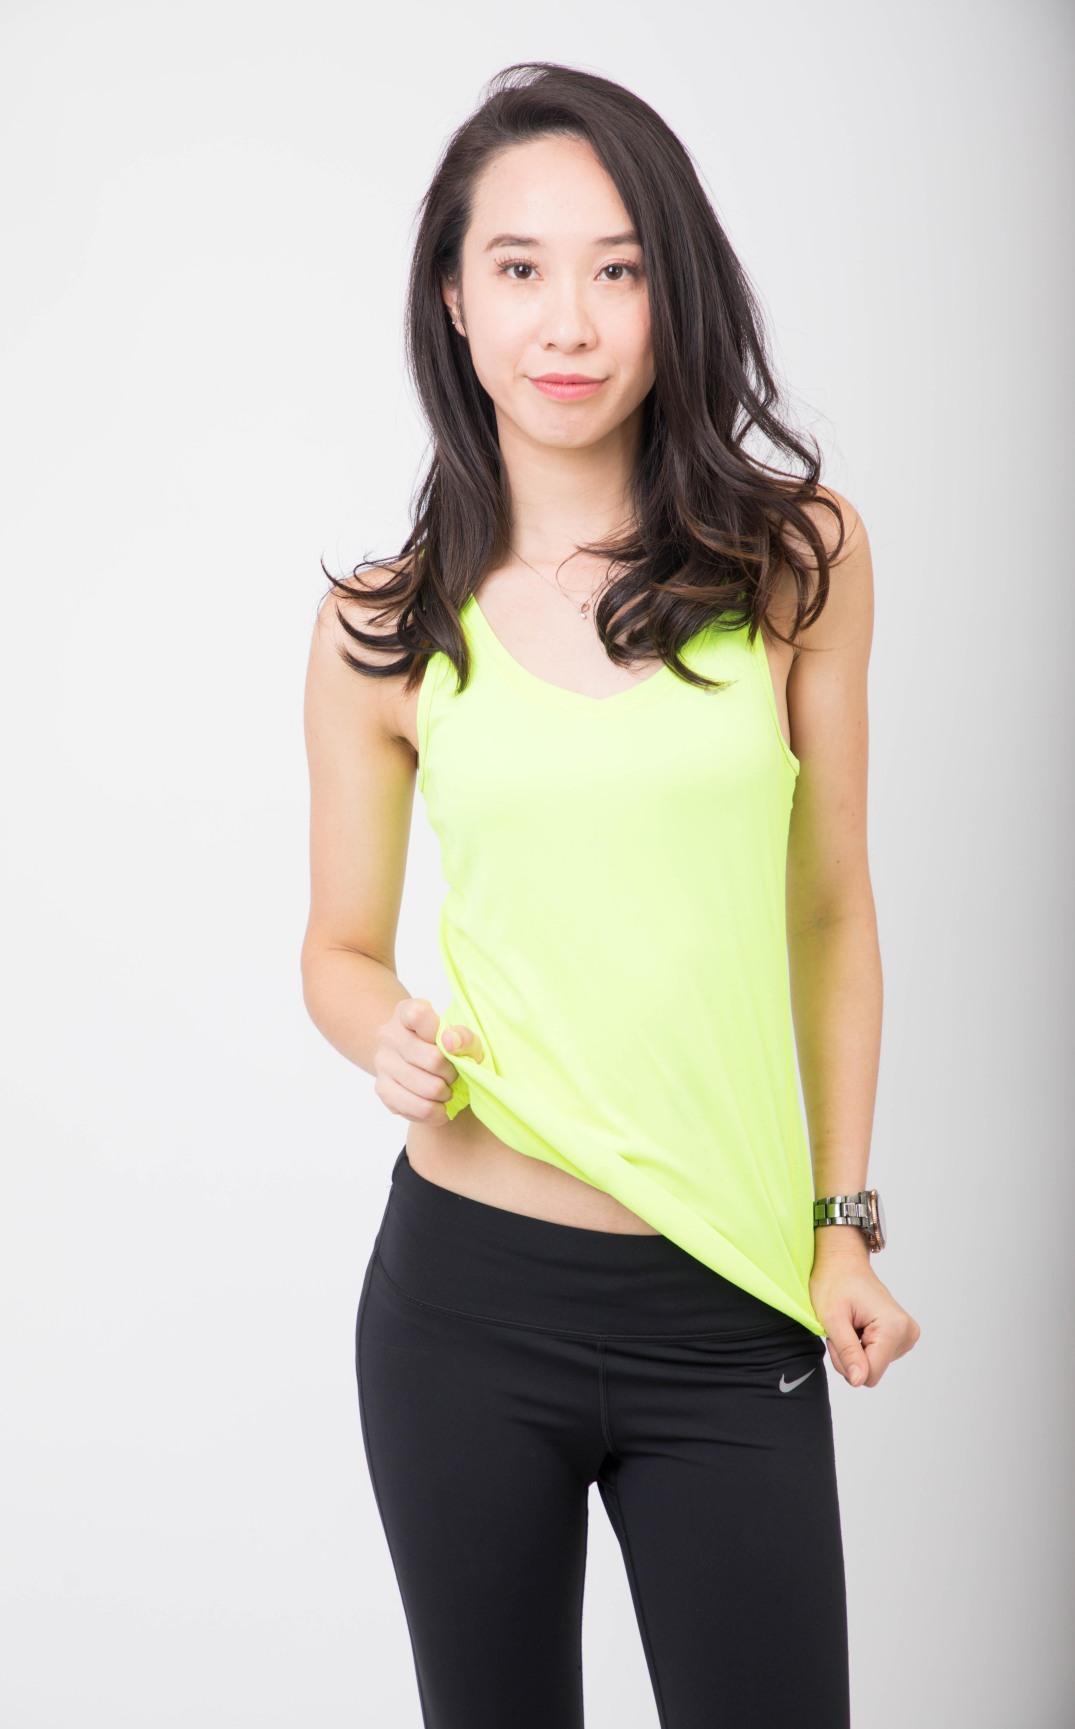 廣告化妝髮型攝影服務_paulstylist_model_Eliska-23